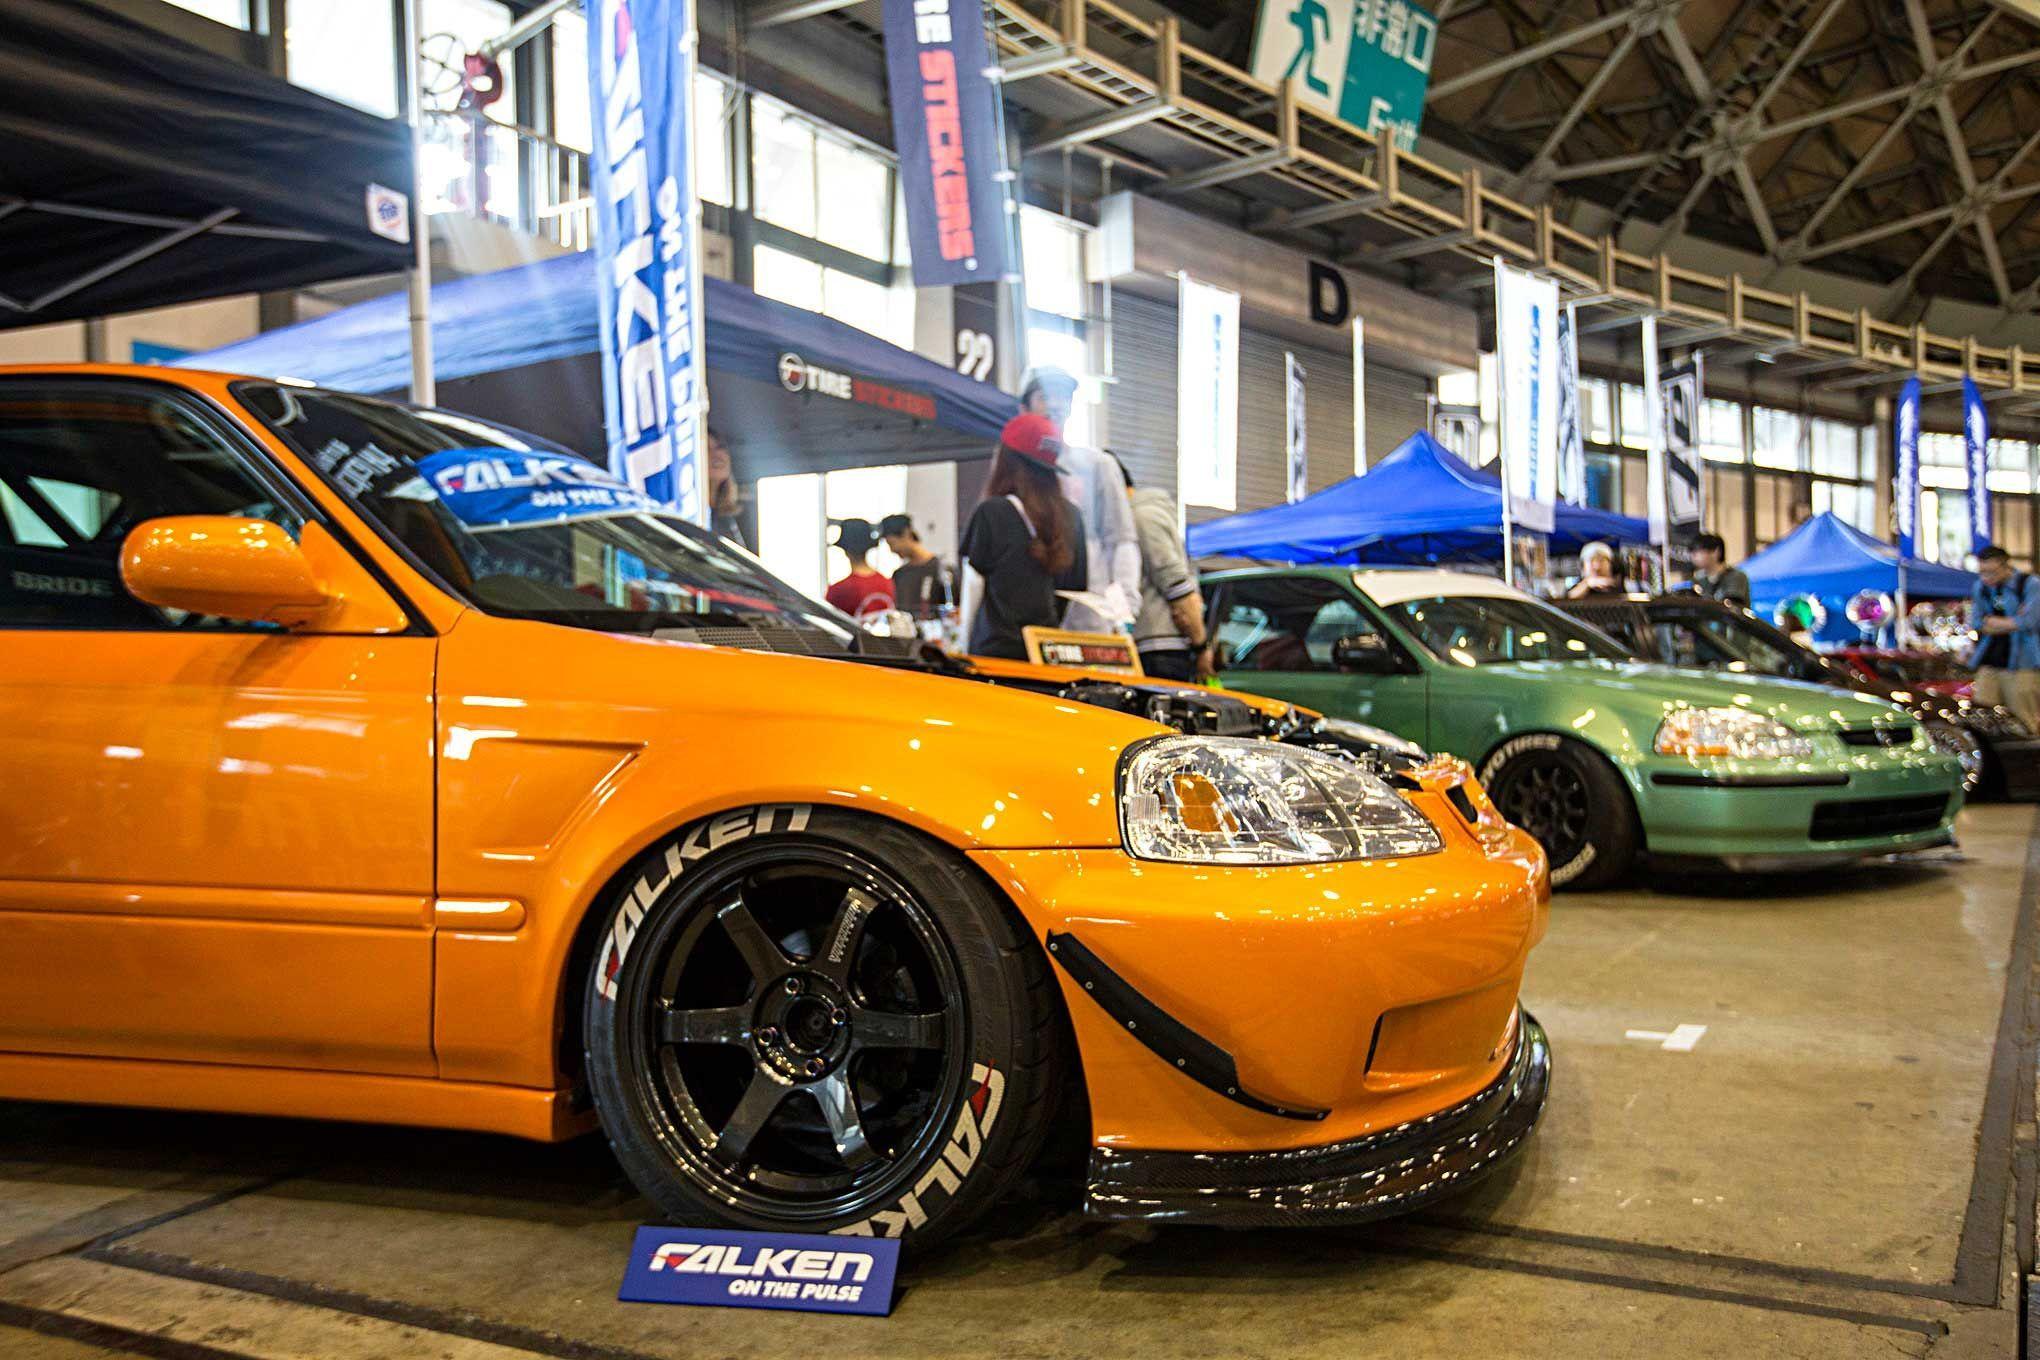 Hondas of Wekfest Japan 2017